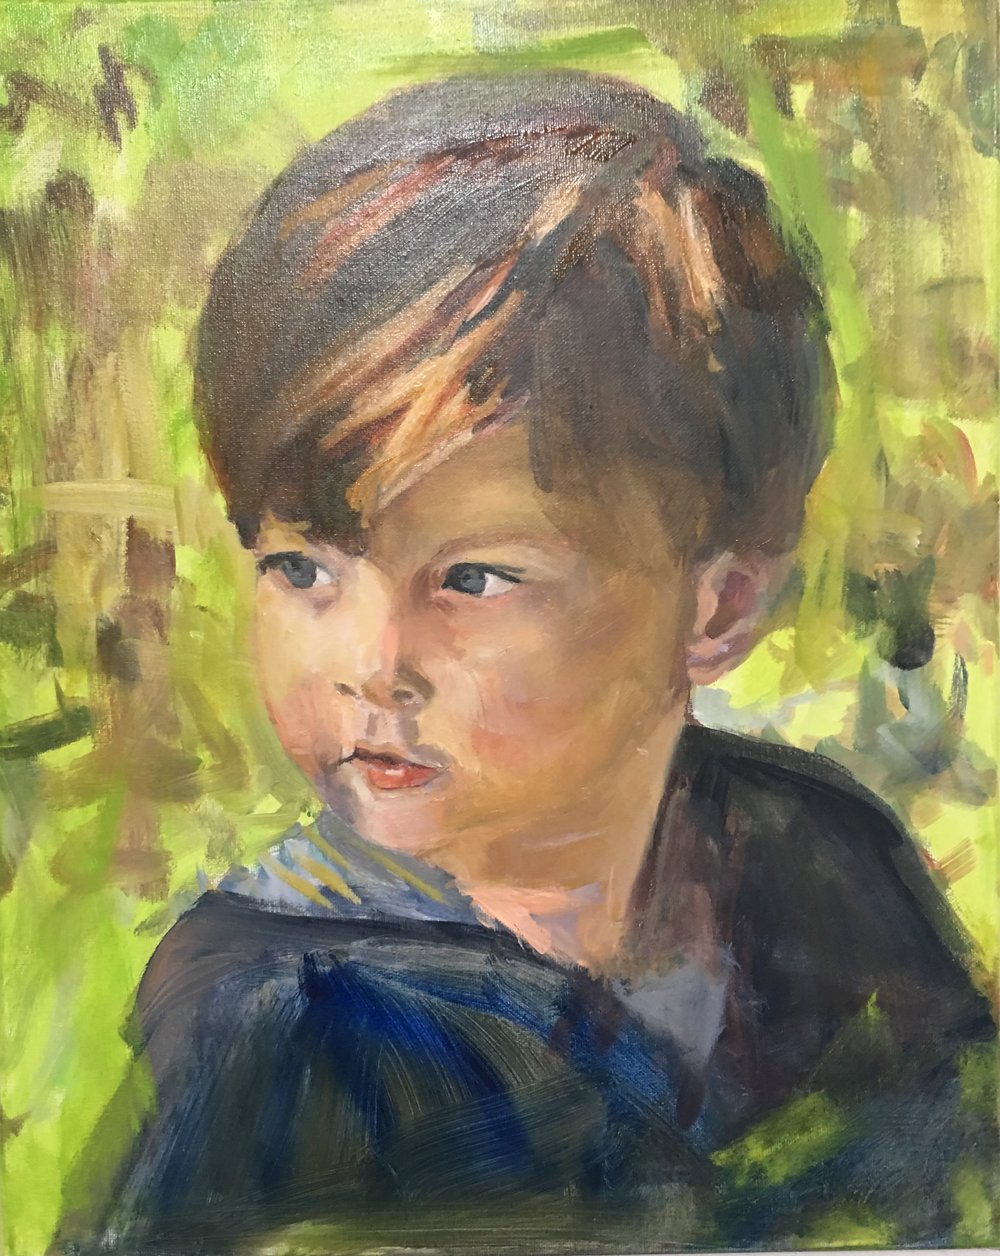 William, Oil on canvas, 20 x 16